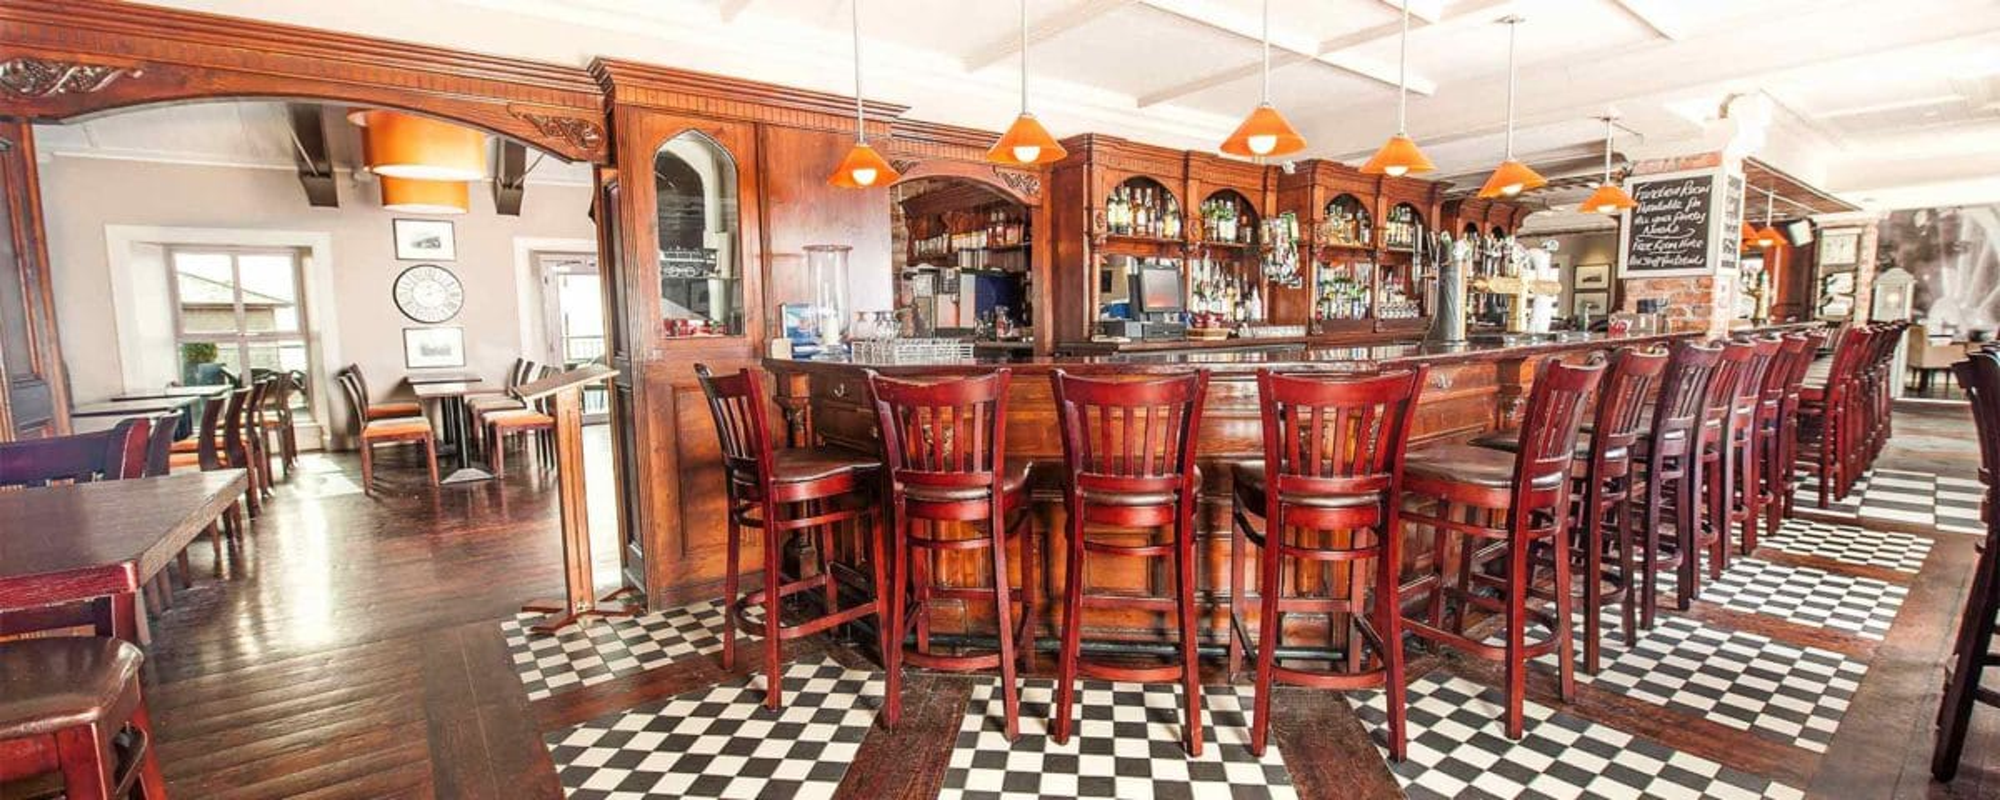 Clancys Bar Restaurant Youghal Co Cork Ireland